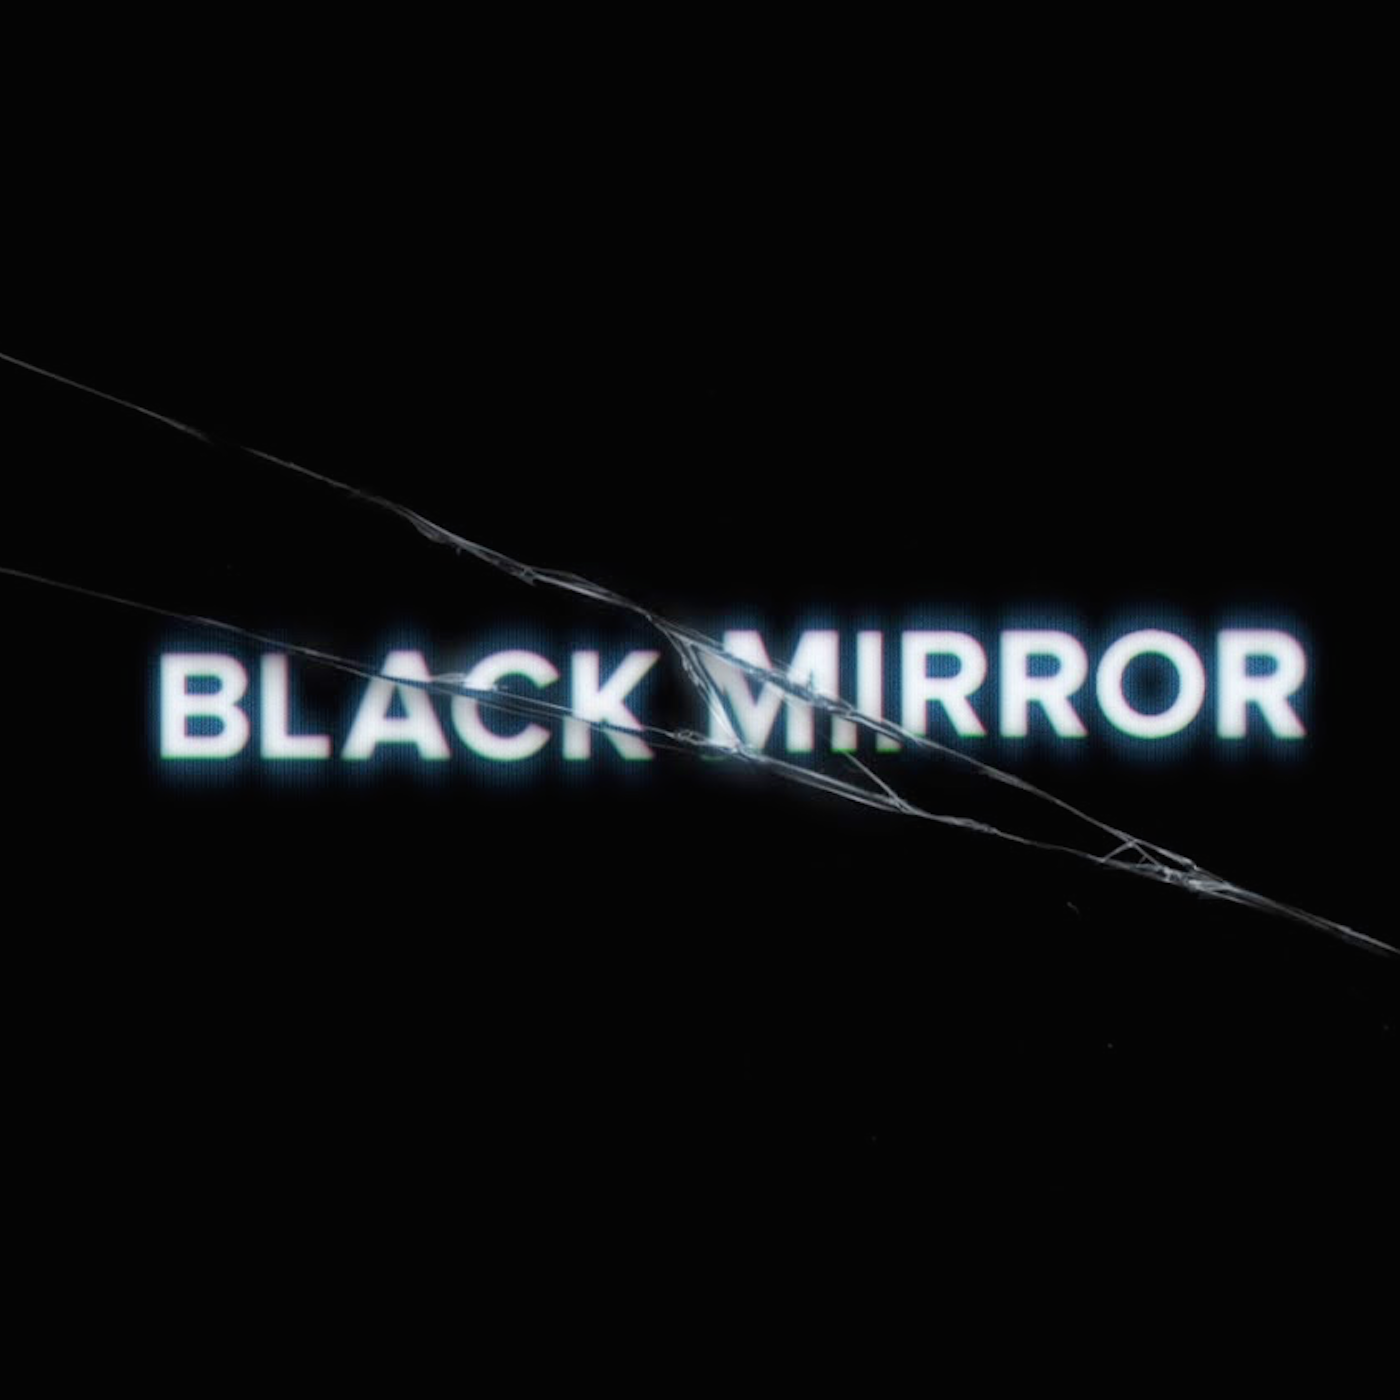 Black Mirror 1400